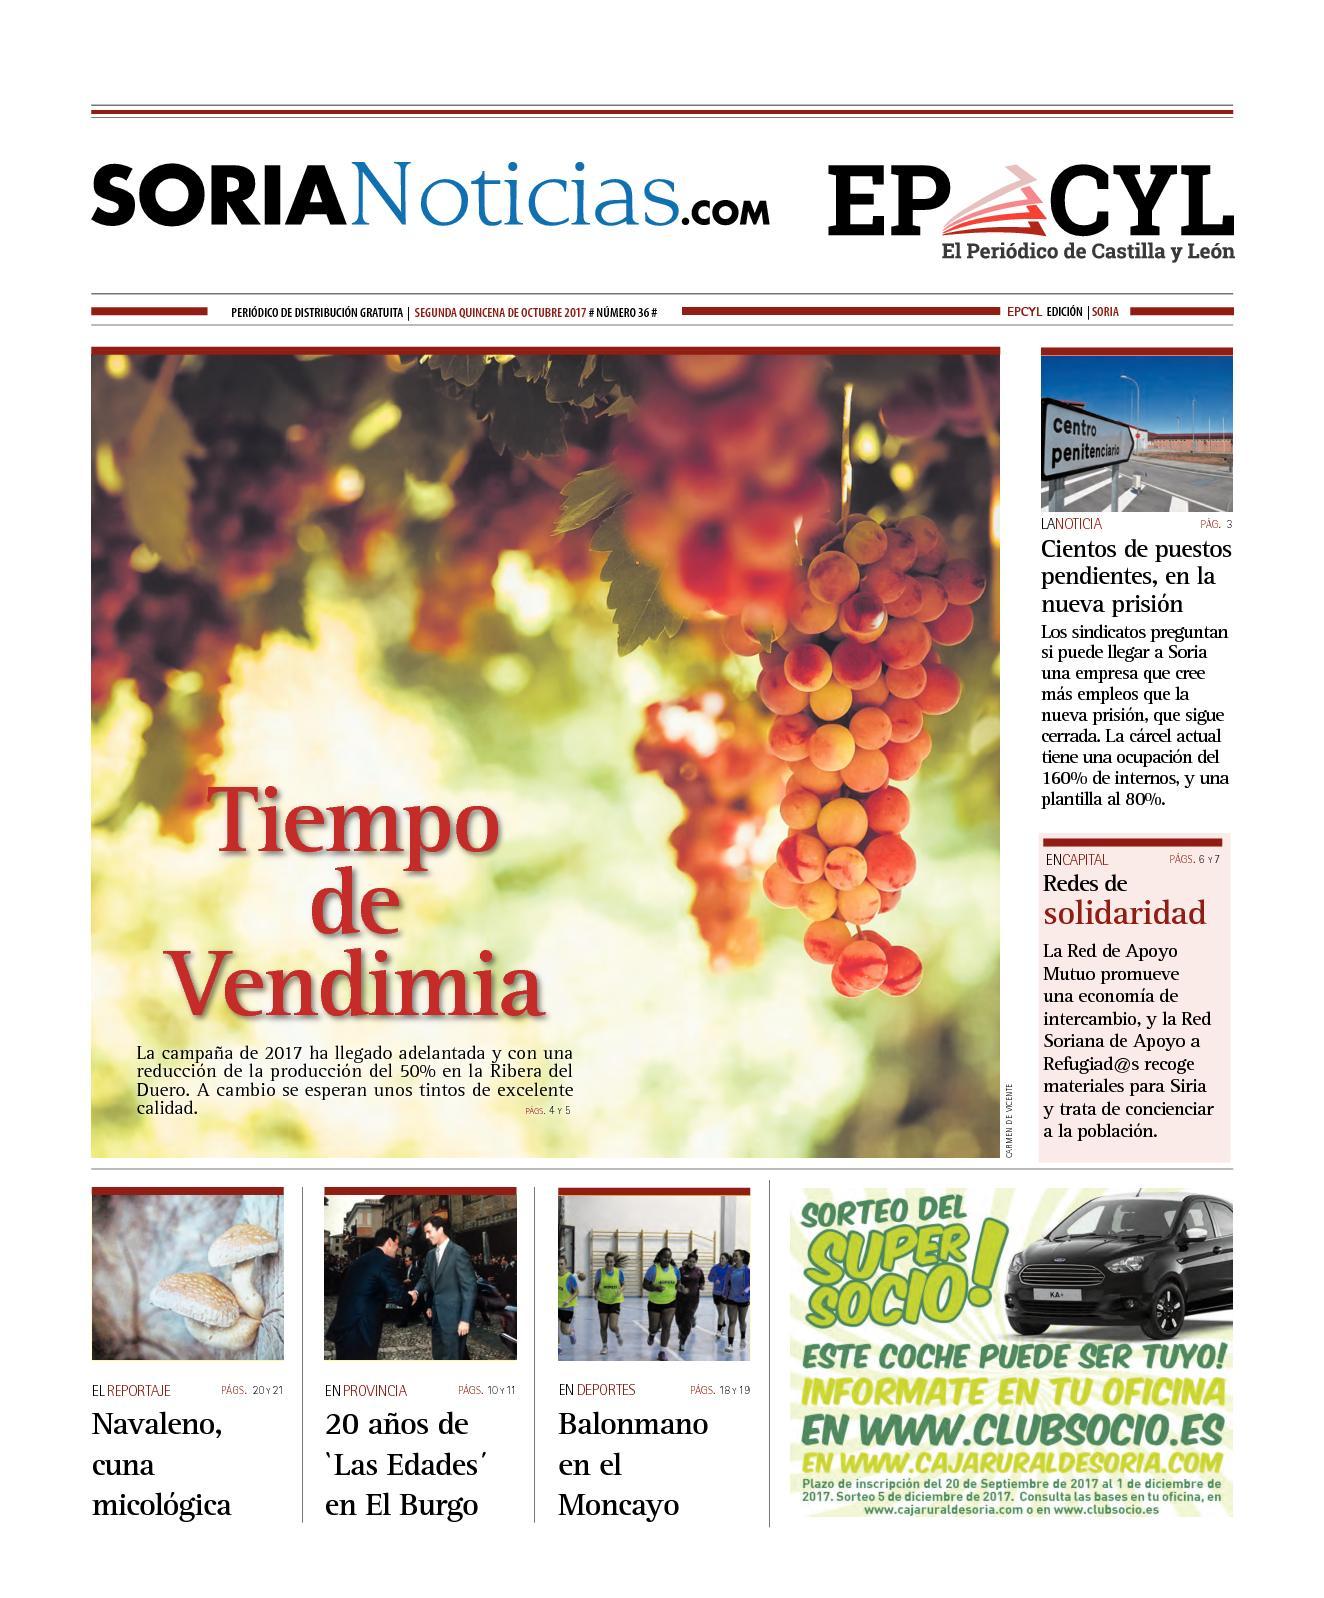 Calaméo - N36- Sorianoticias - EPCYL